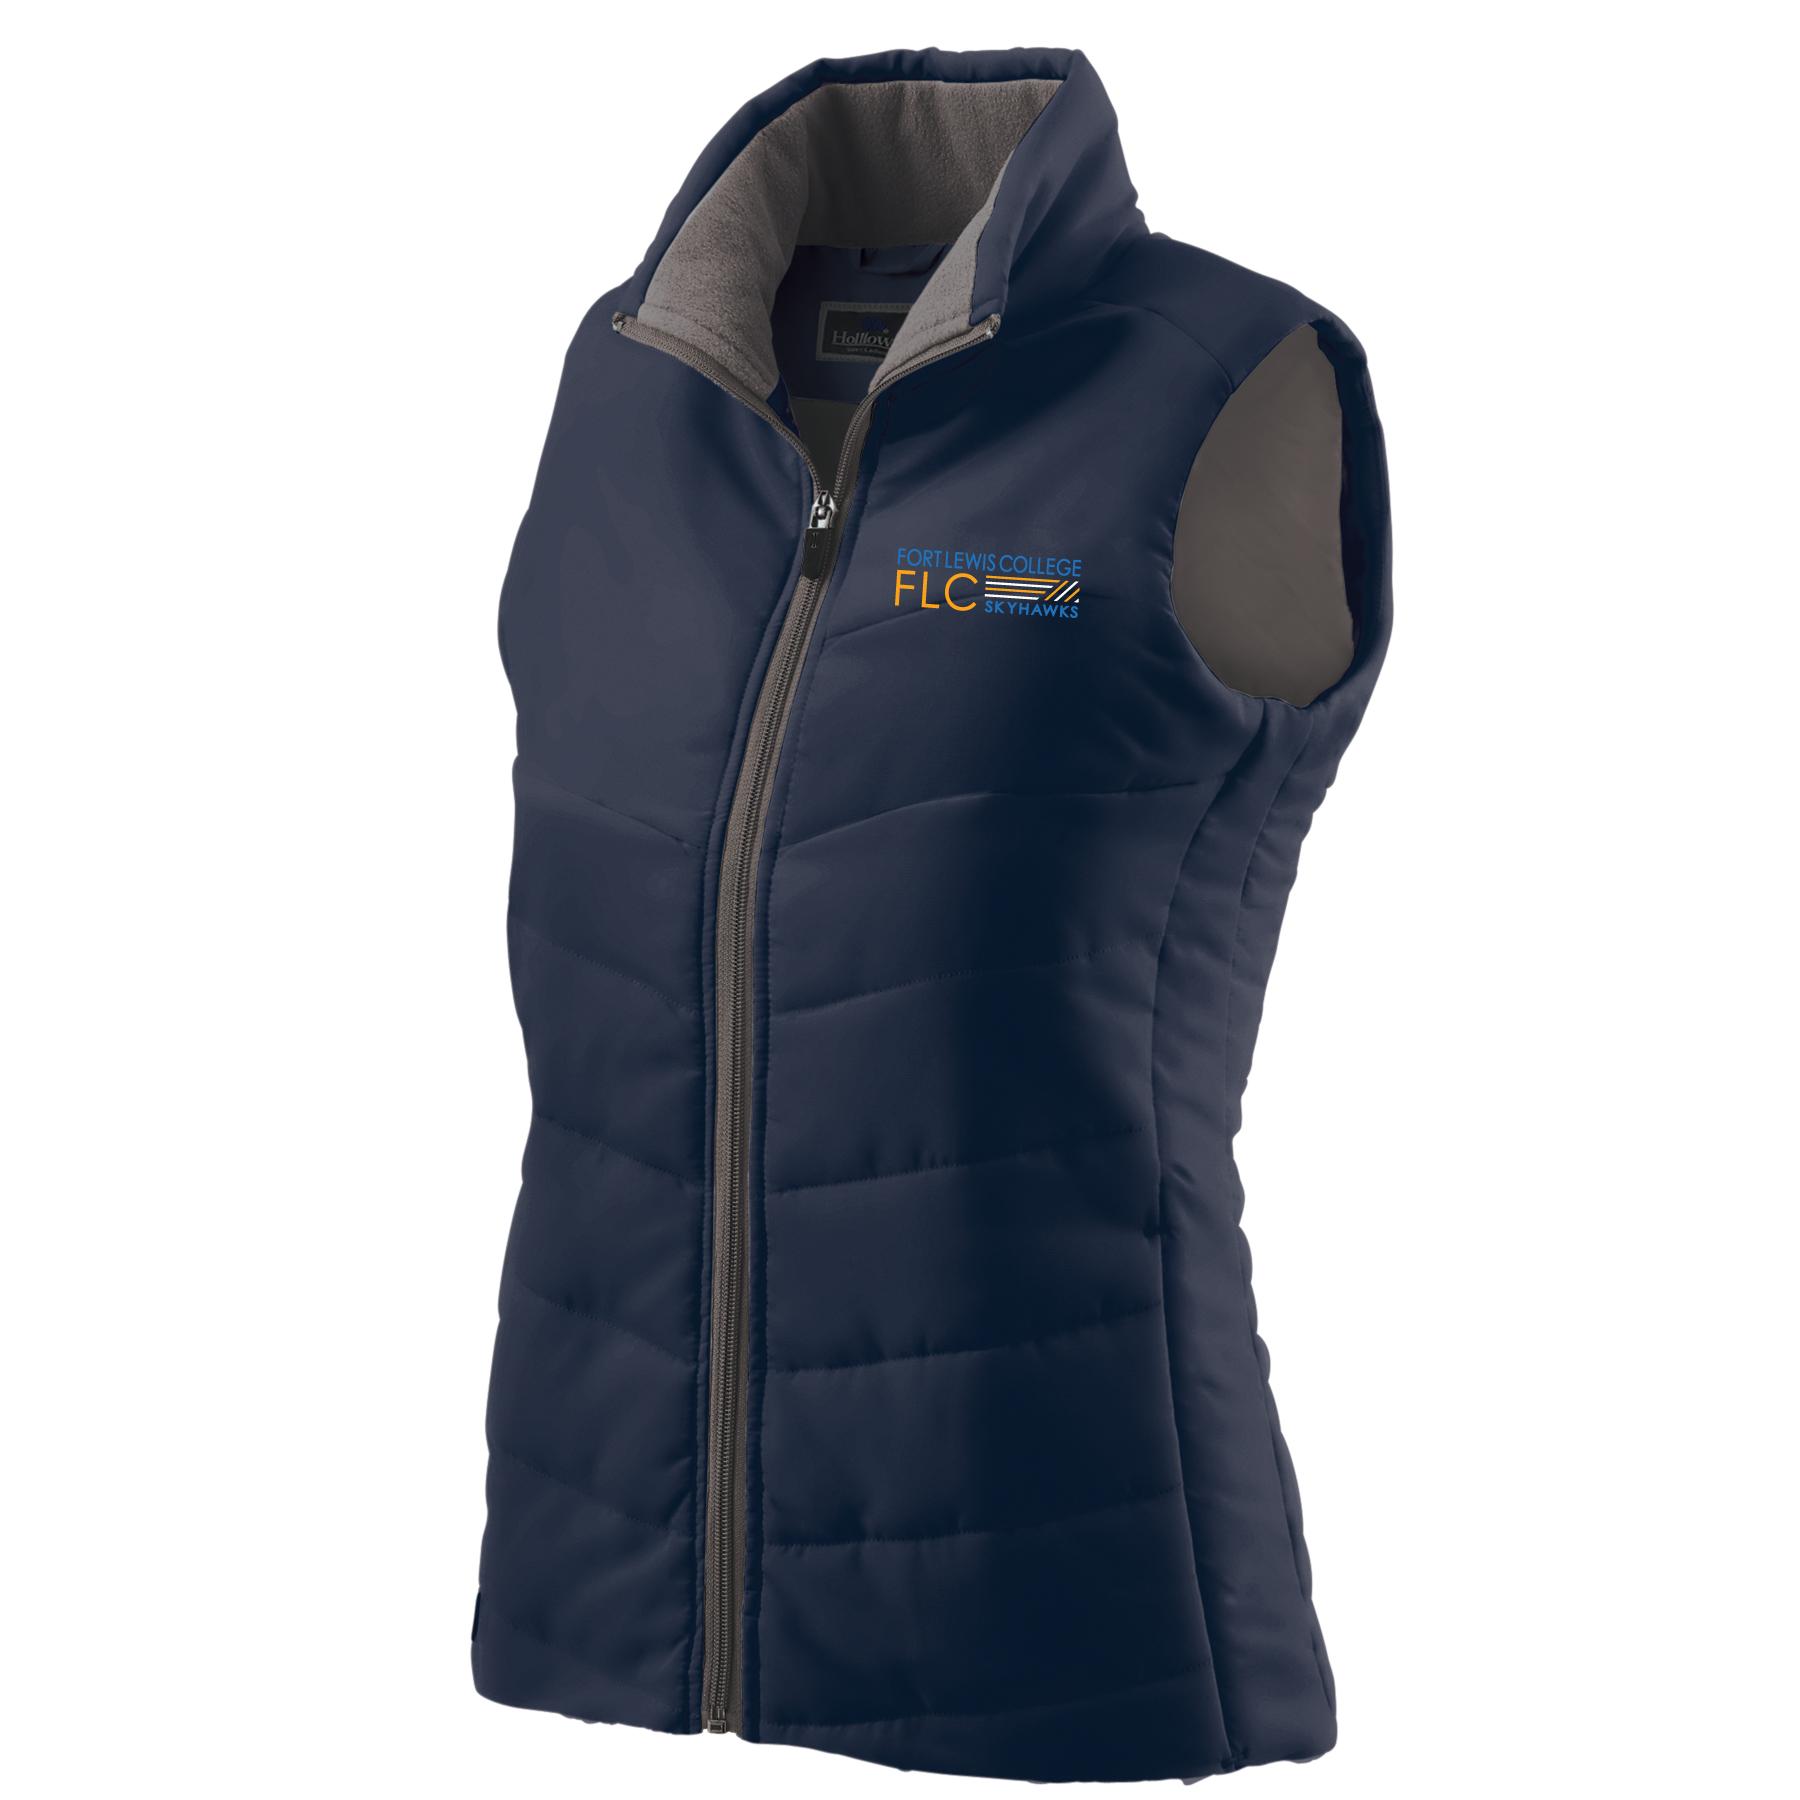 FLC Women's Admire Vest